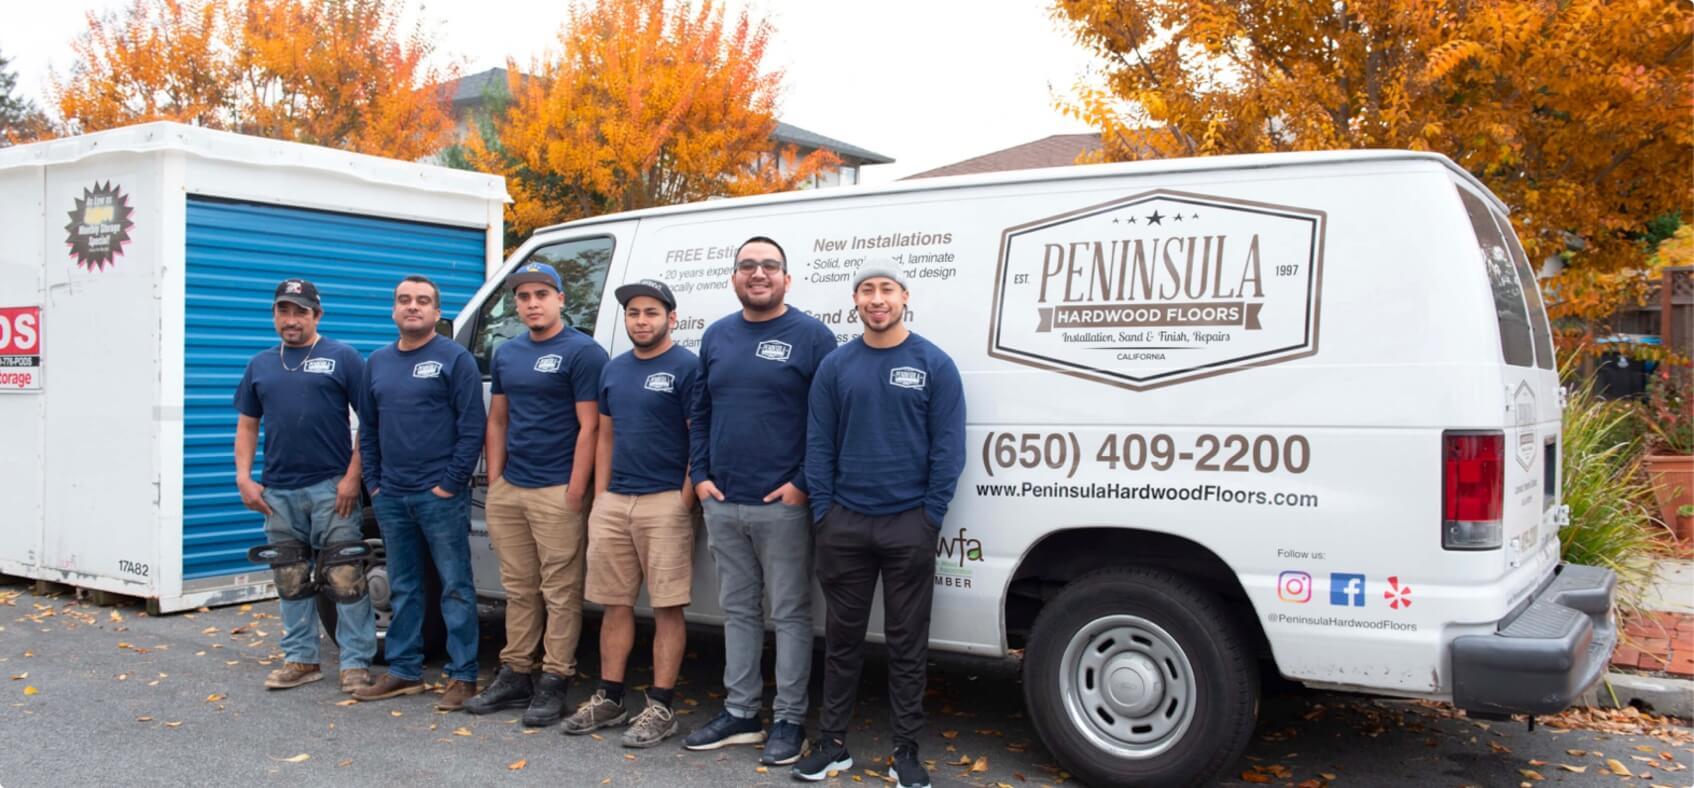 Peninsula team next to van.